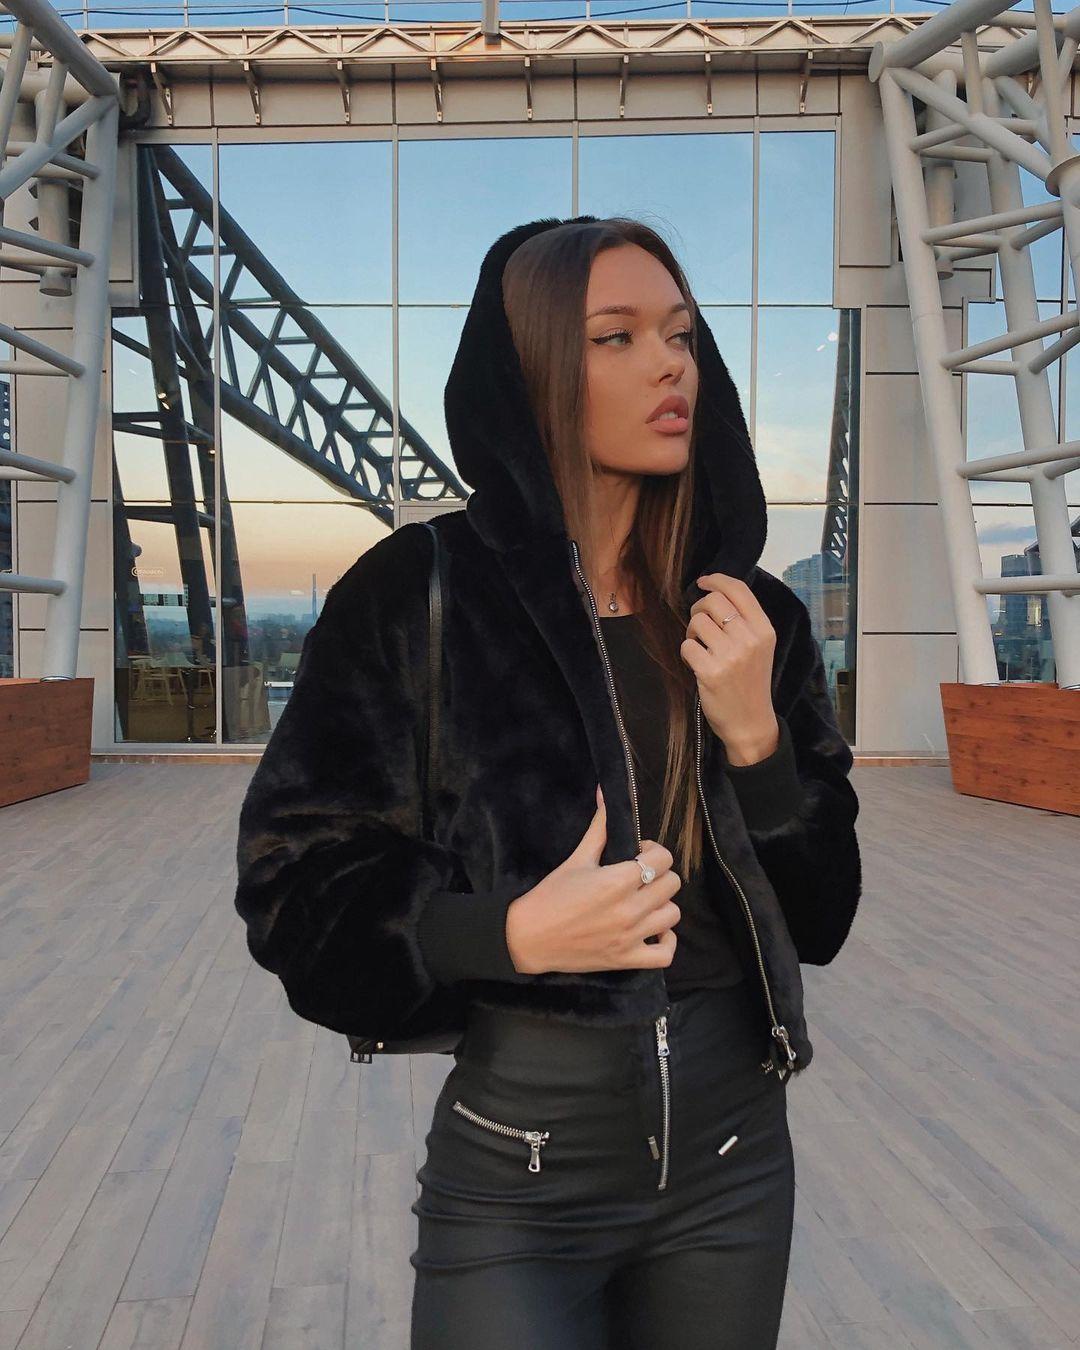 Natalie-Danish-Wallpapers-Insta-Biography-11